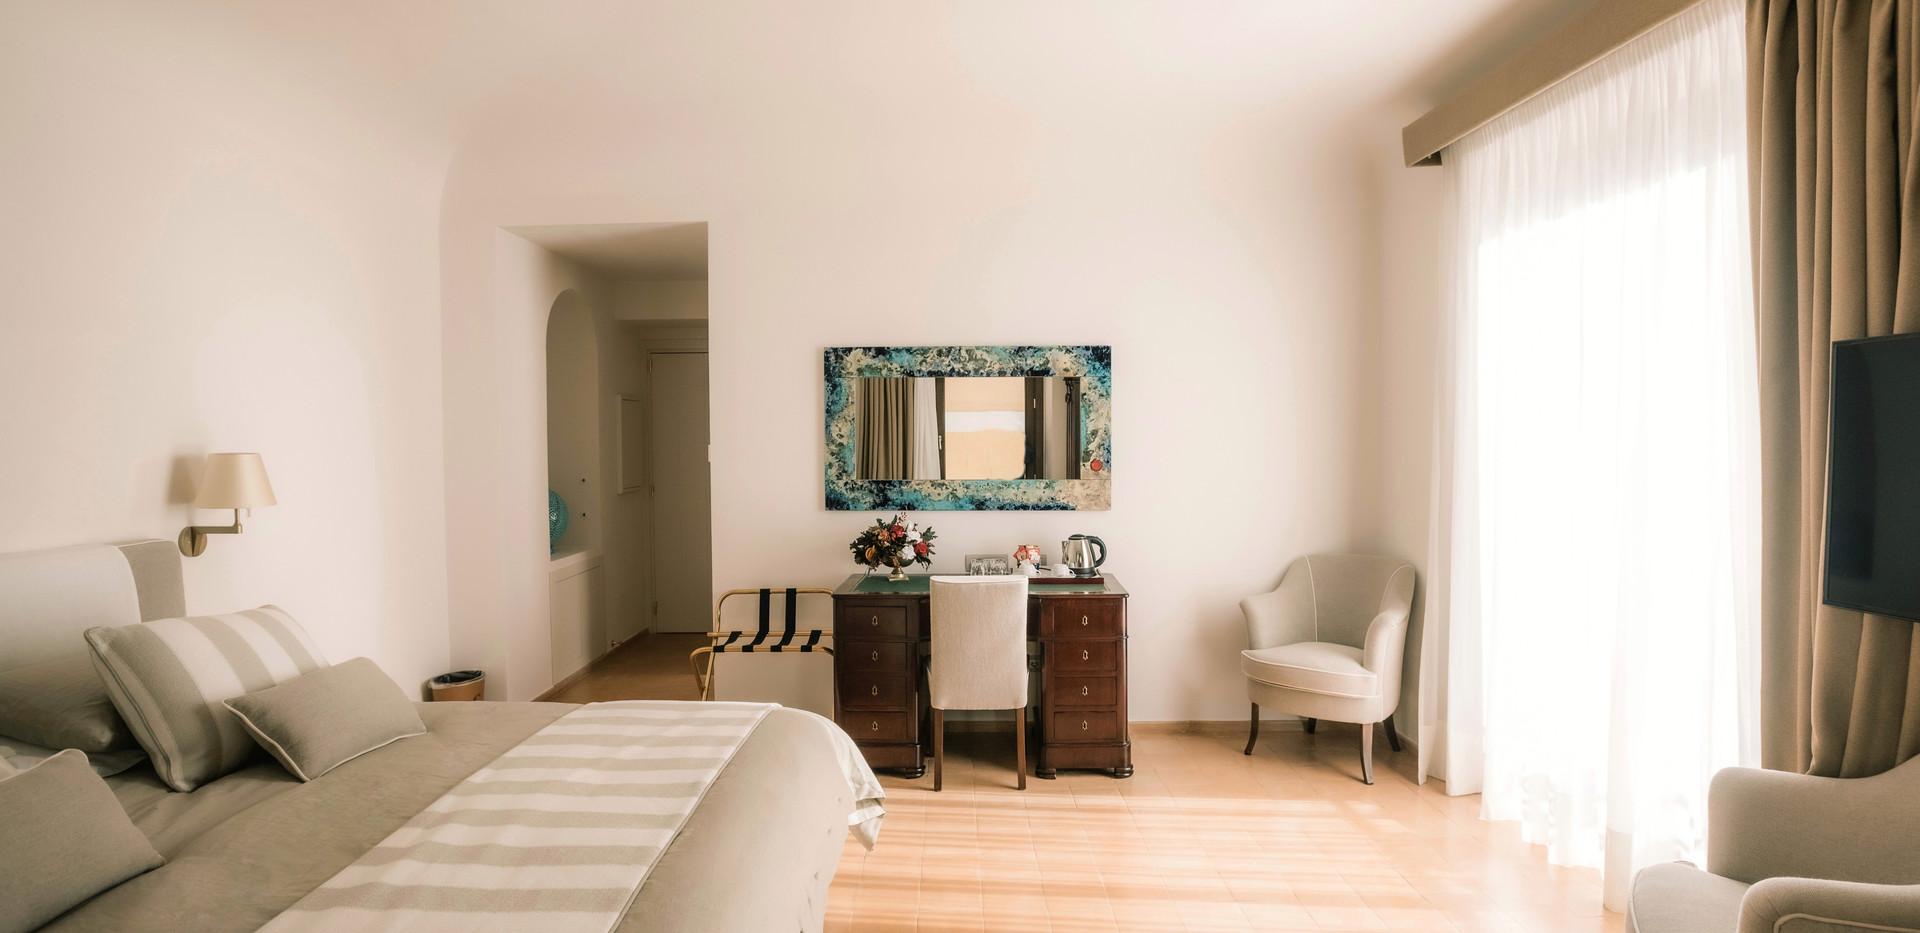 Room Escher_02 Giardini Calce_LuxuryRoom